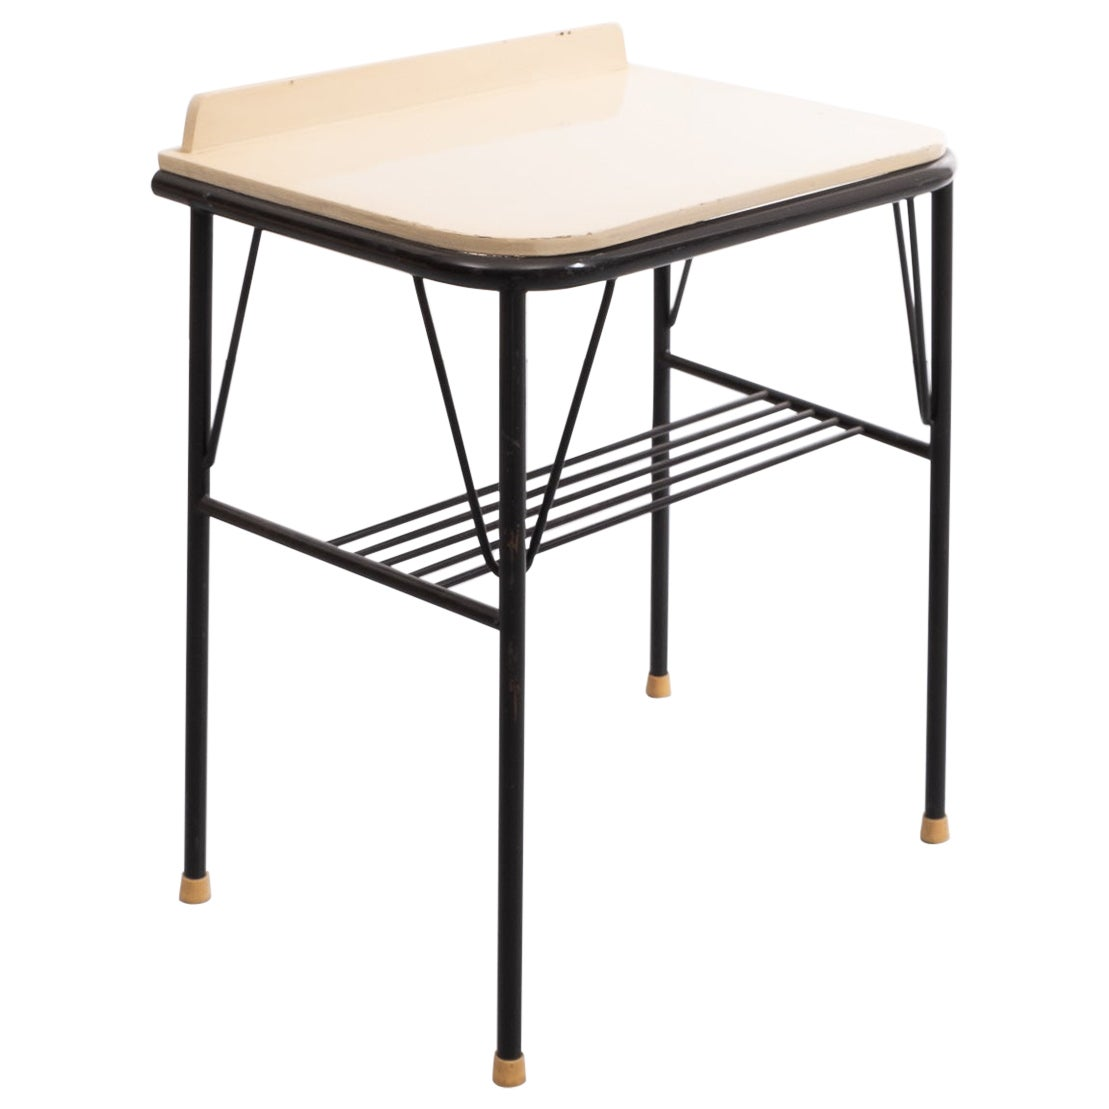 Side Table Femafa Denhaag, 1950s, Holland